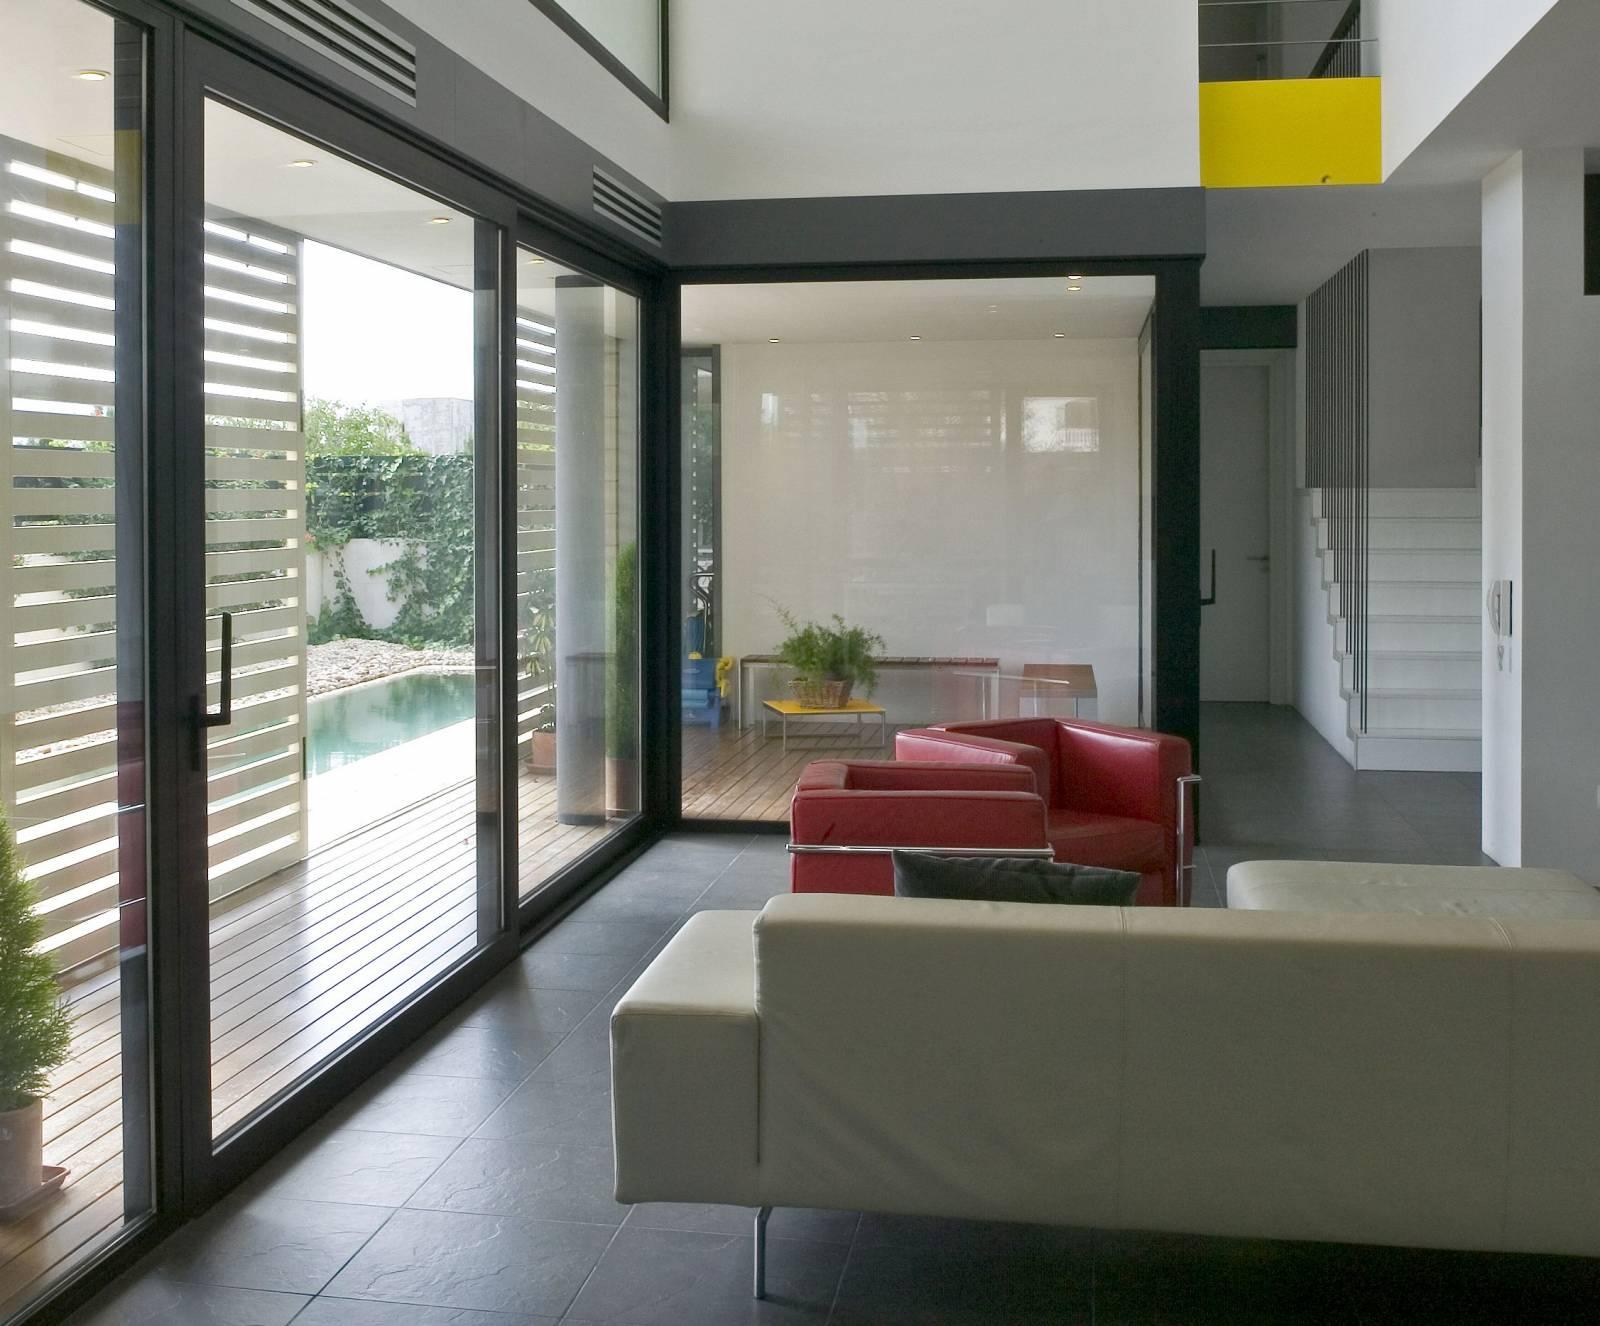 baie vitr e coulissante technal ch ssis coulissant lumeal aix en provence 13100 entreprise. Black Bedroom Furniture Sets. Home Design Ideas